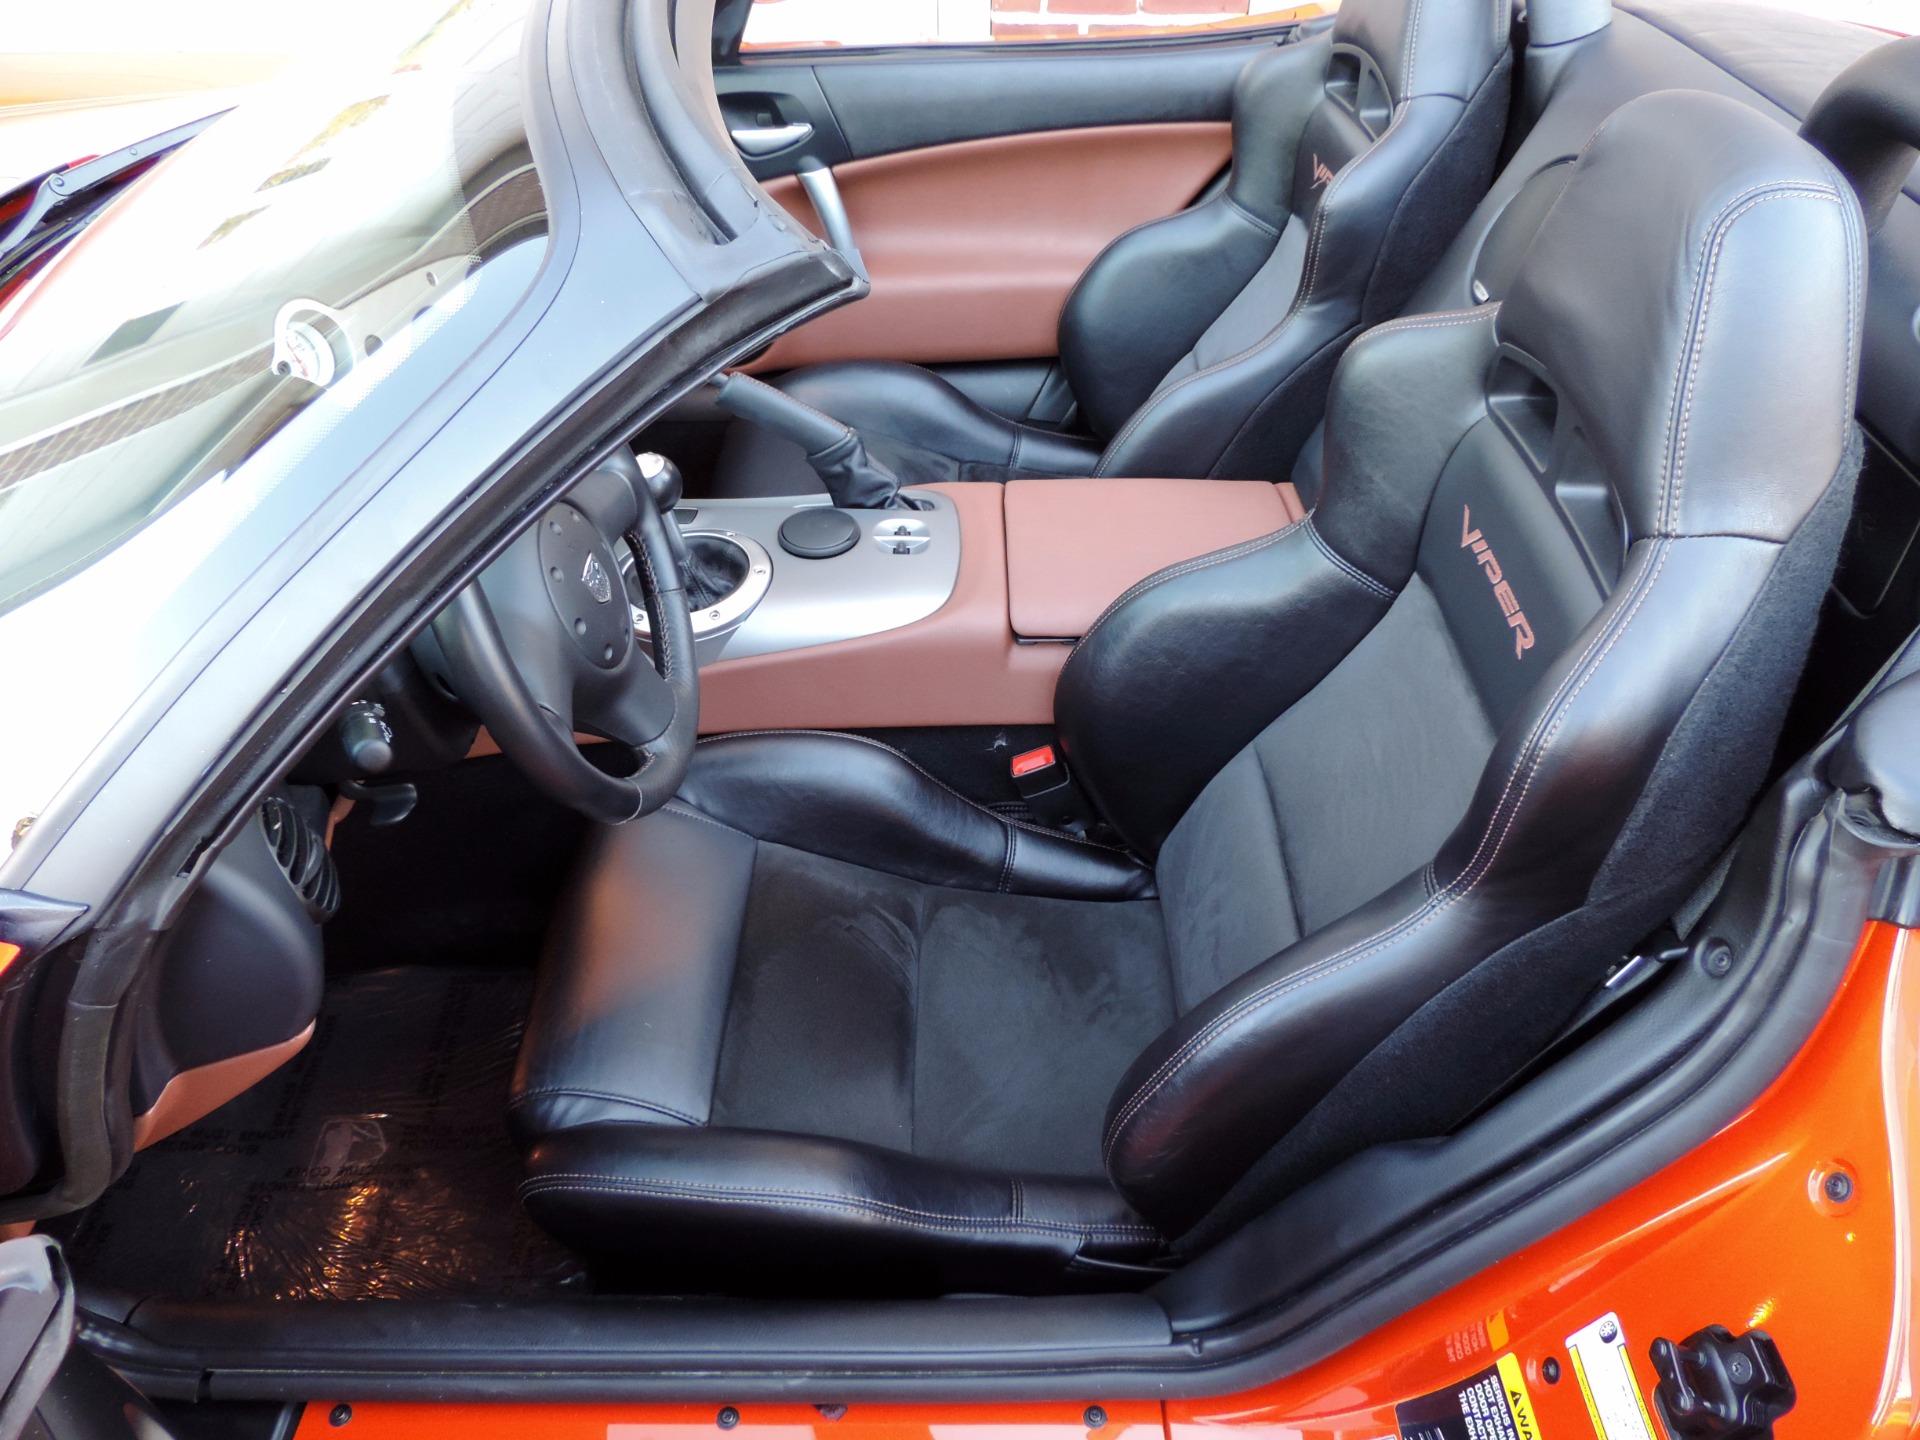 2008 Dodge Viper Srt 10 Stock 201291 For Sale Near